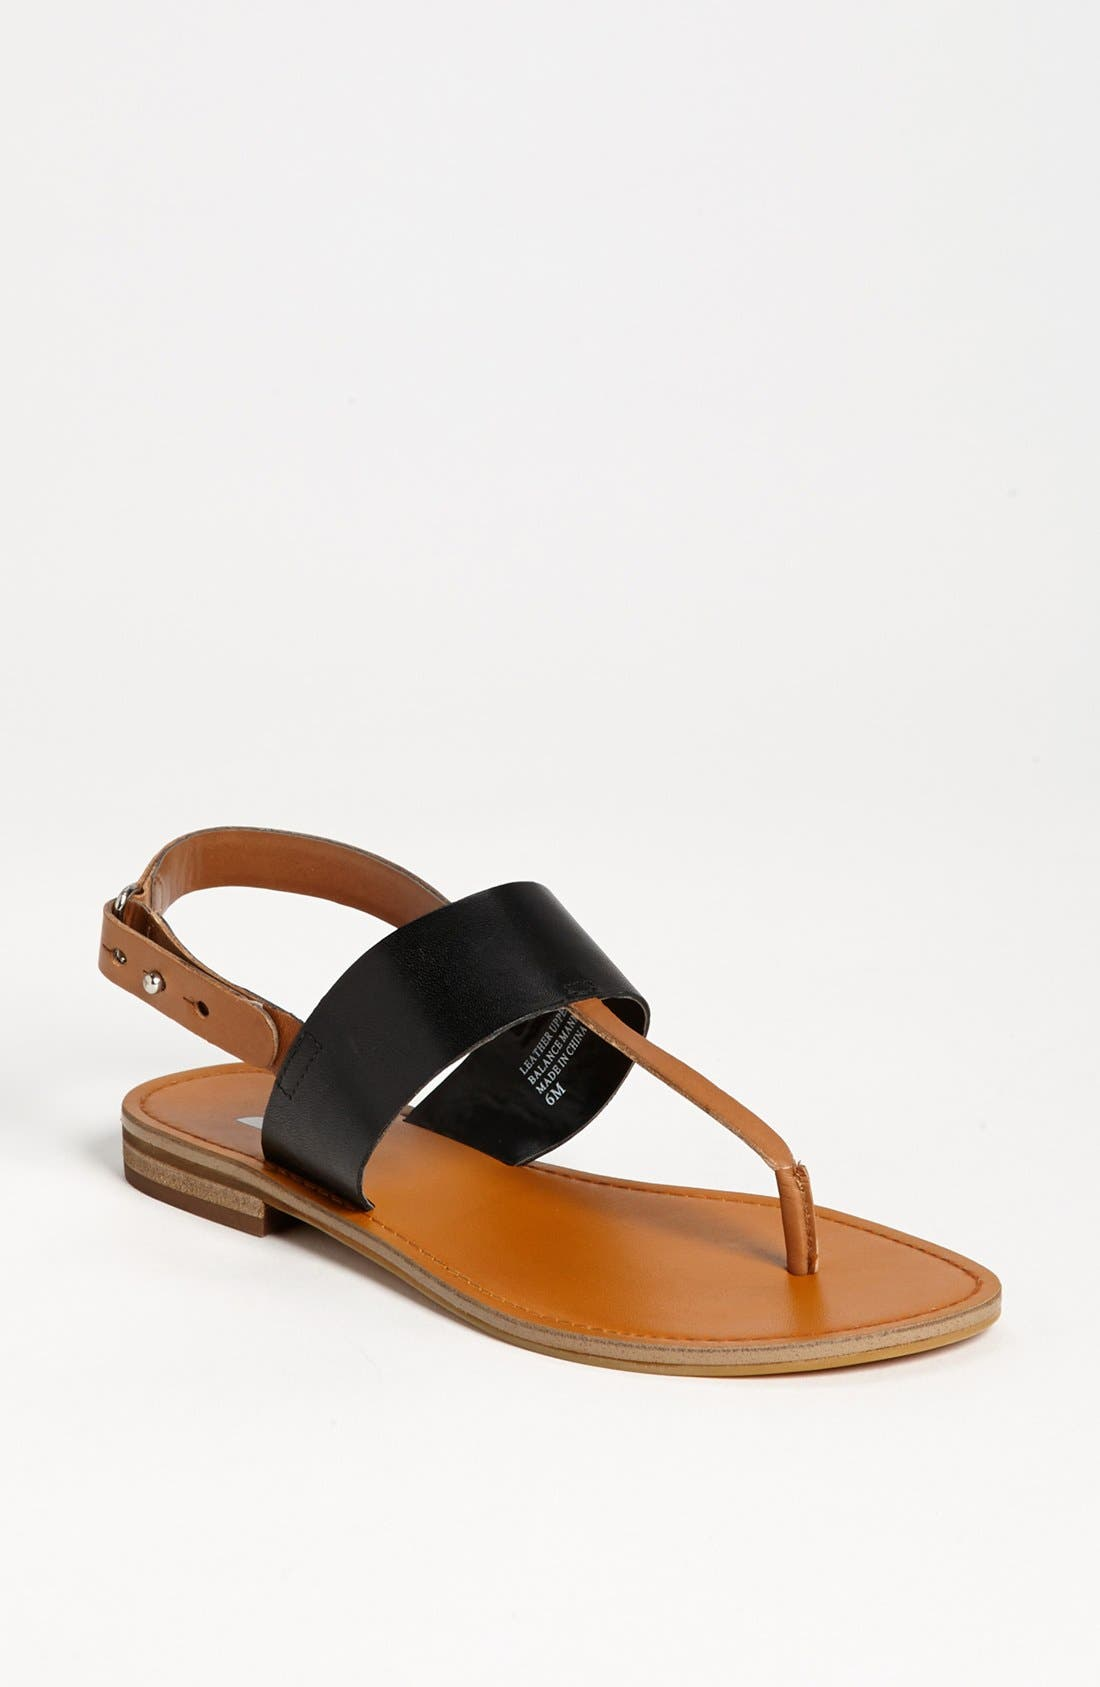 BP.,                             'Barbados' Sandal,                             Main thumbnail 1, color,                             004